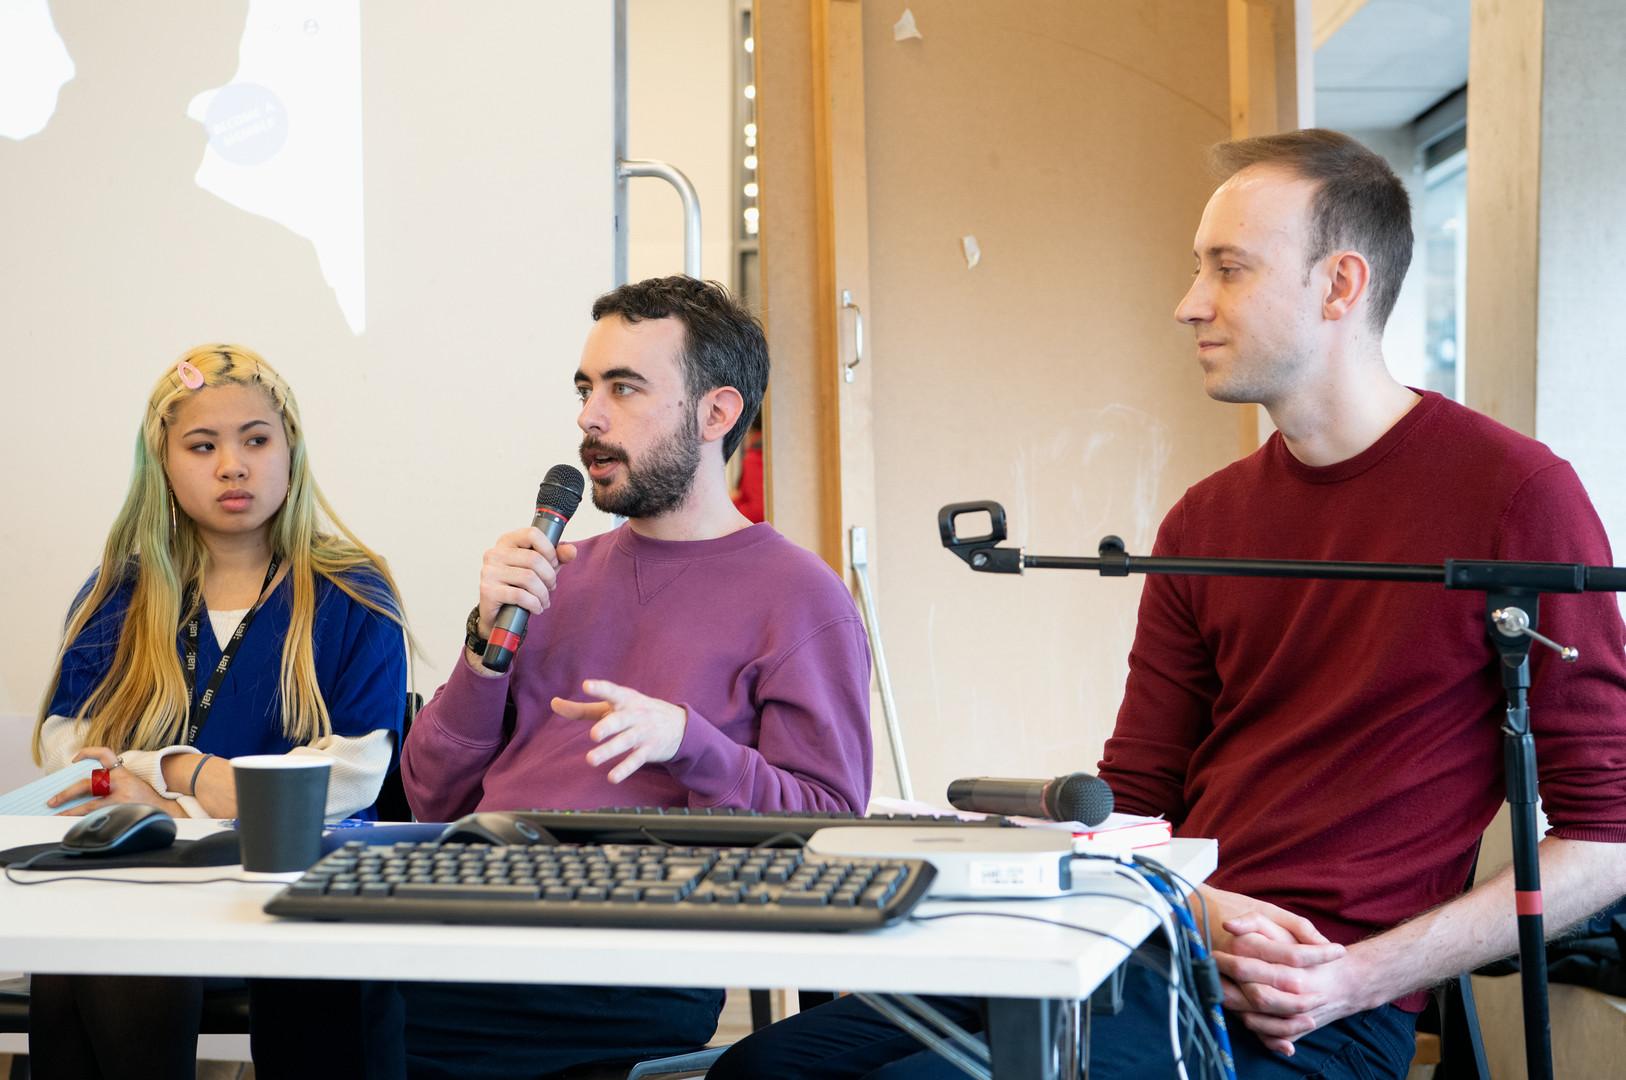 Surveillance panel (from left to right: Maria Than (CRIN), Ioannis Kouvakas (Privacy International), Griff Ferris (Big Brother Watch)) - Photo: Alex Wojcik